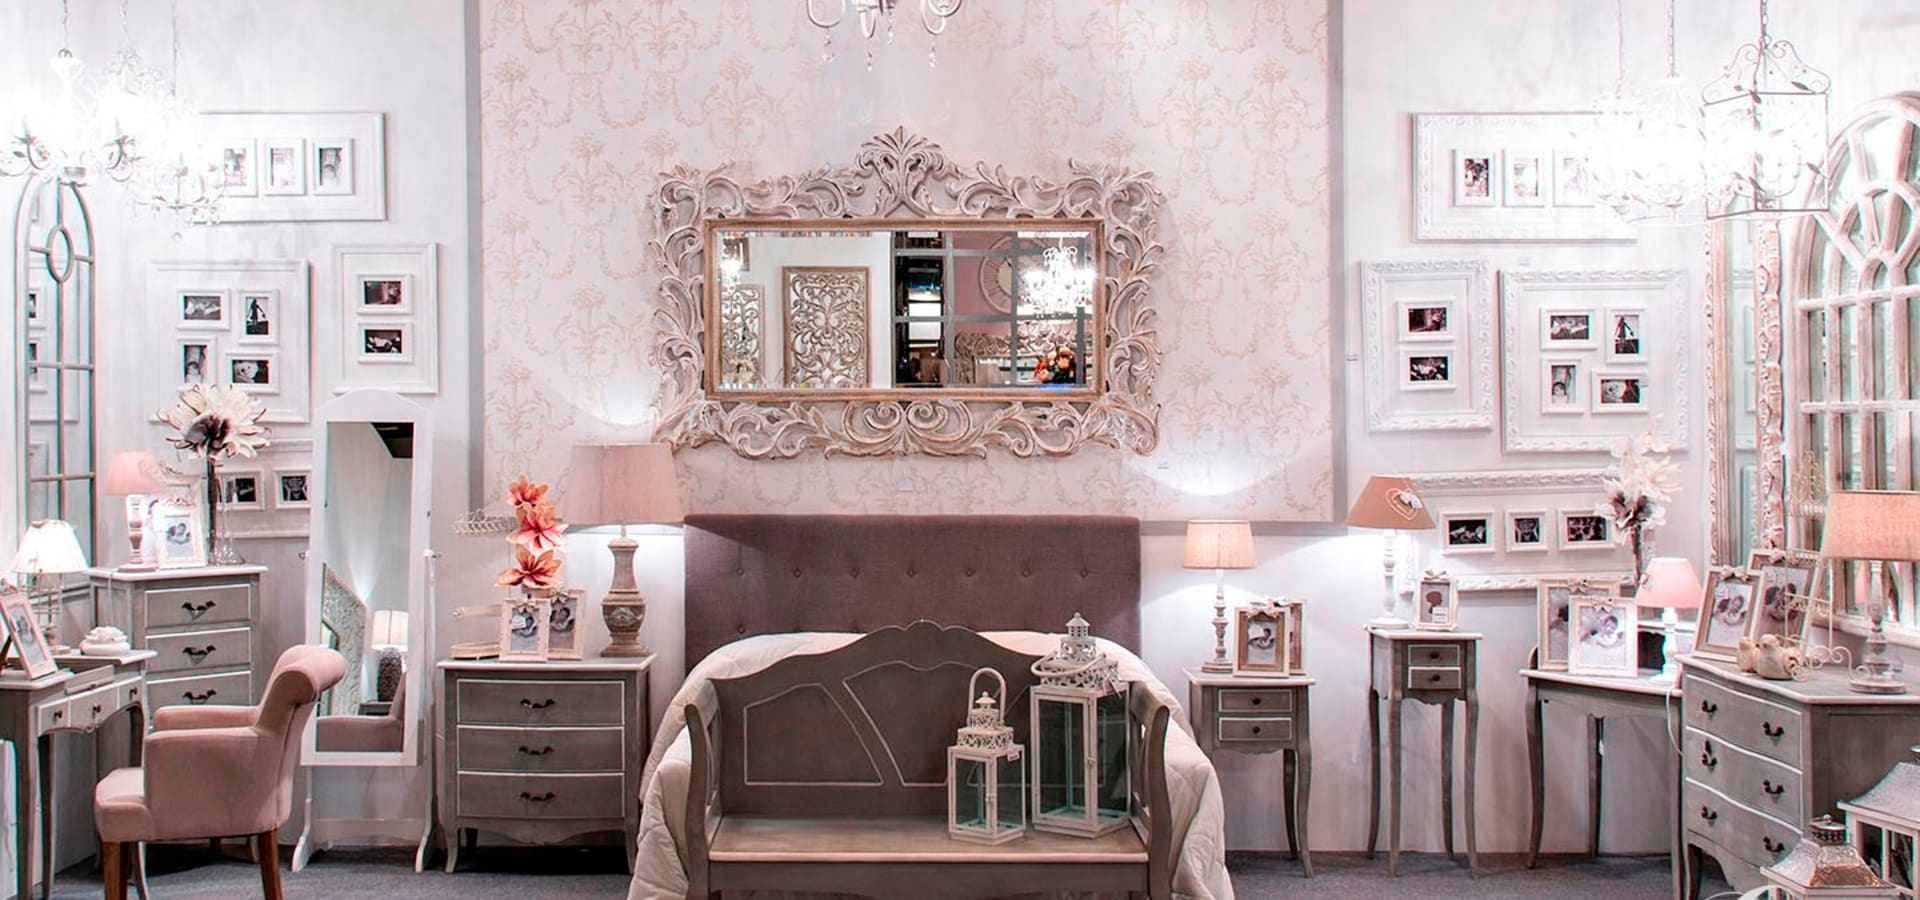 Garpe interiores decoradores y dise adores de interiores - Libros de decoracion de interiores gratis ...